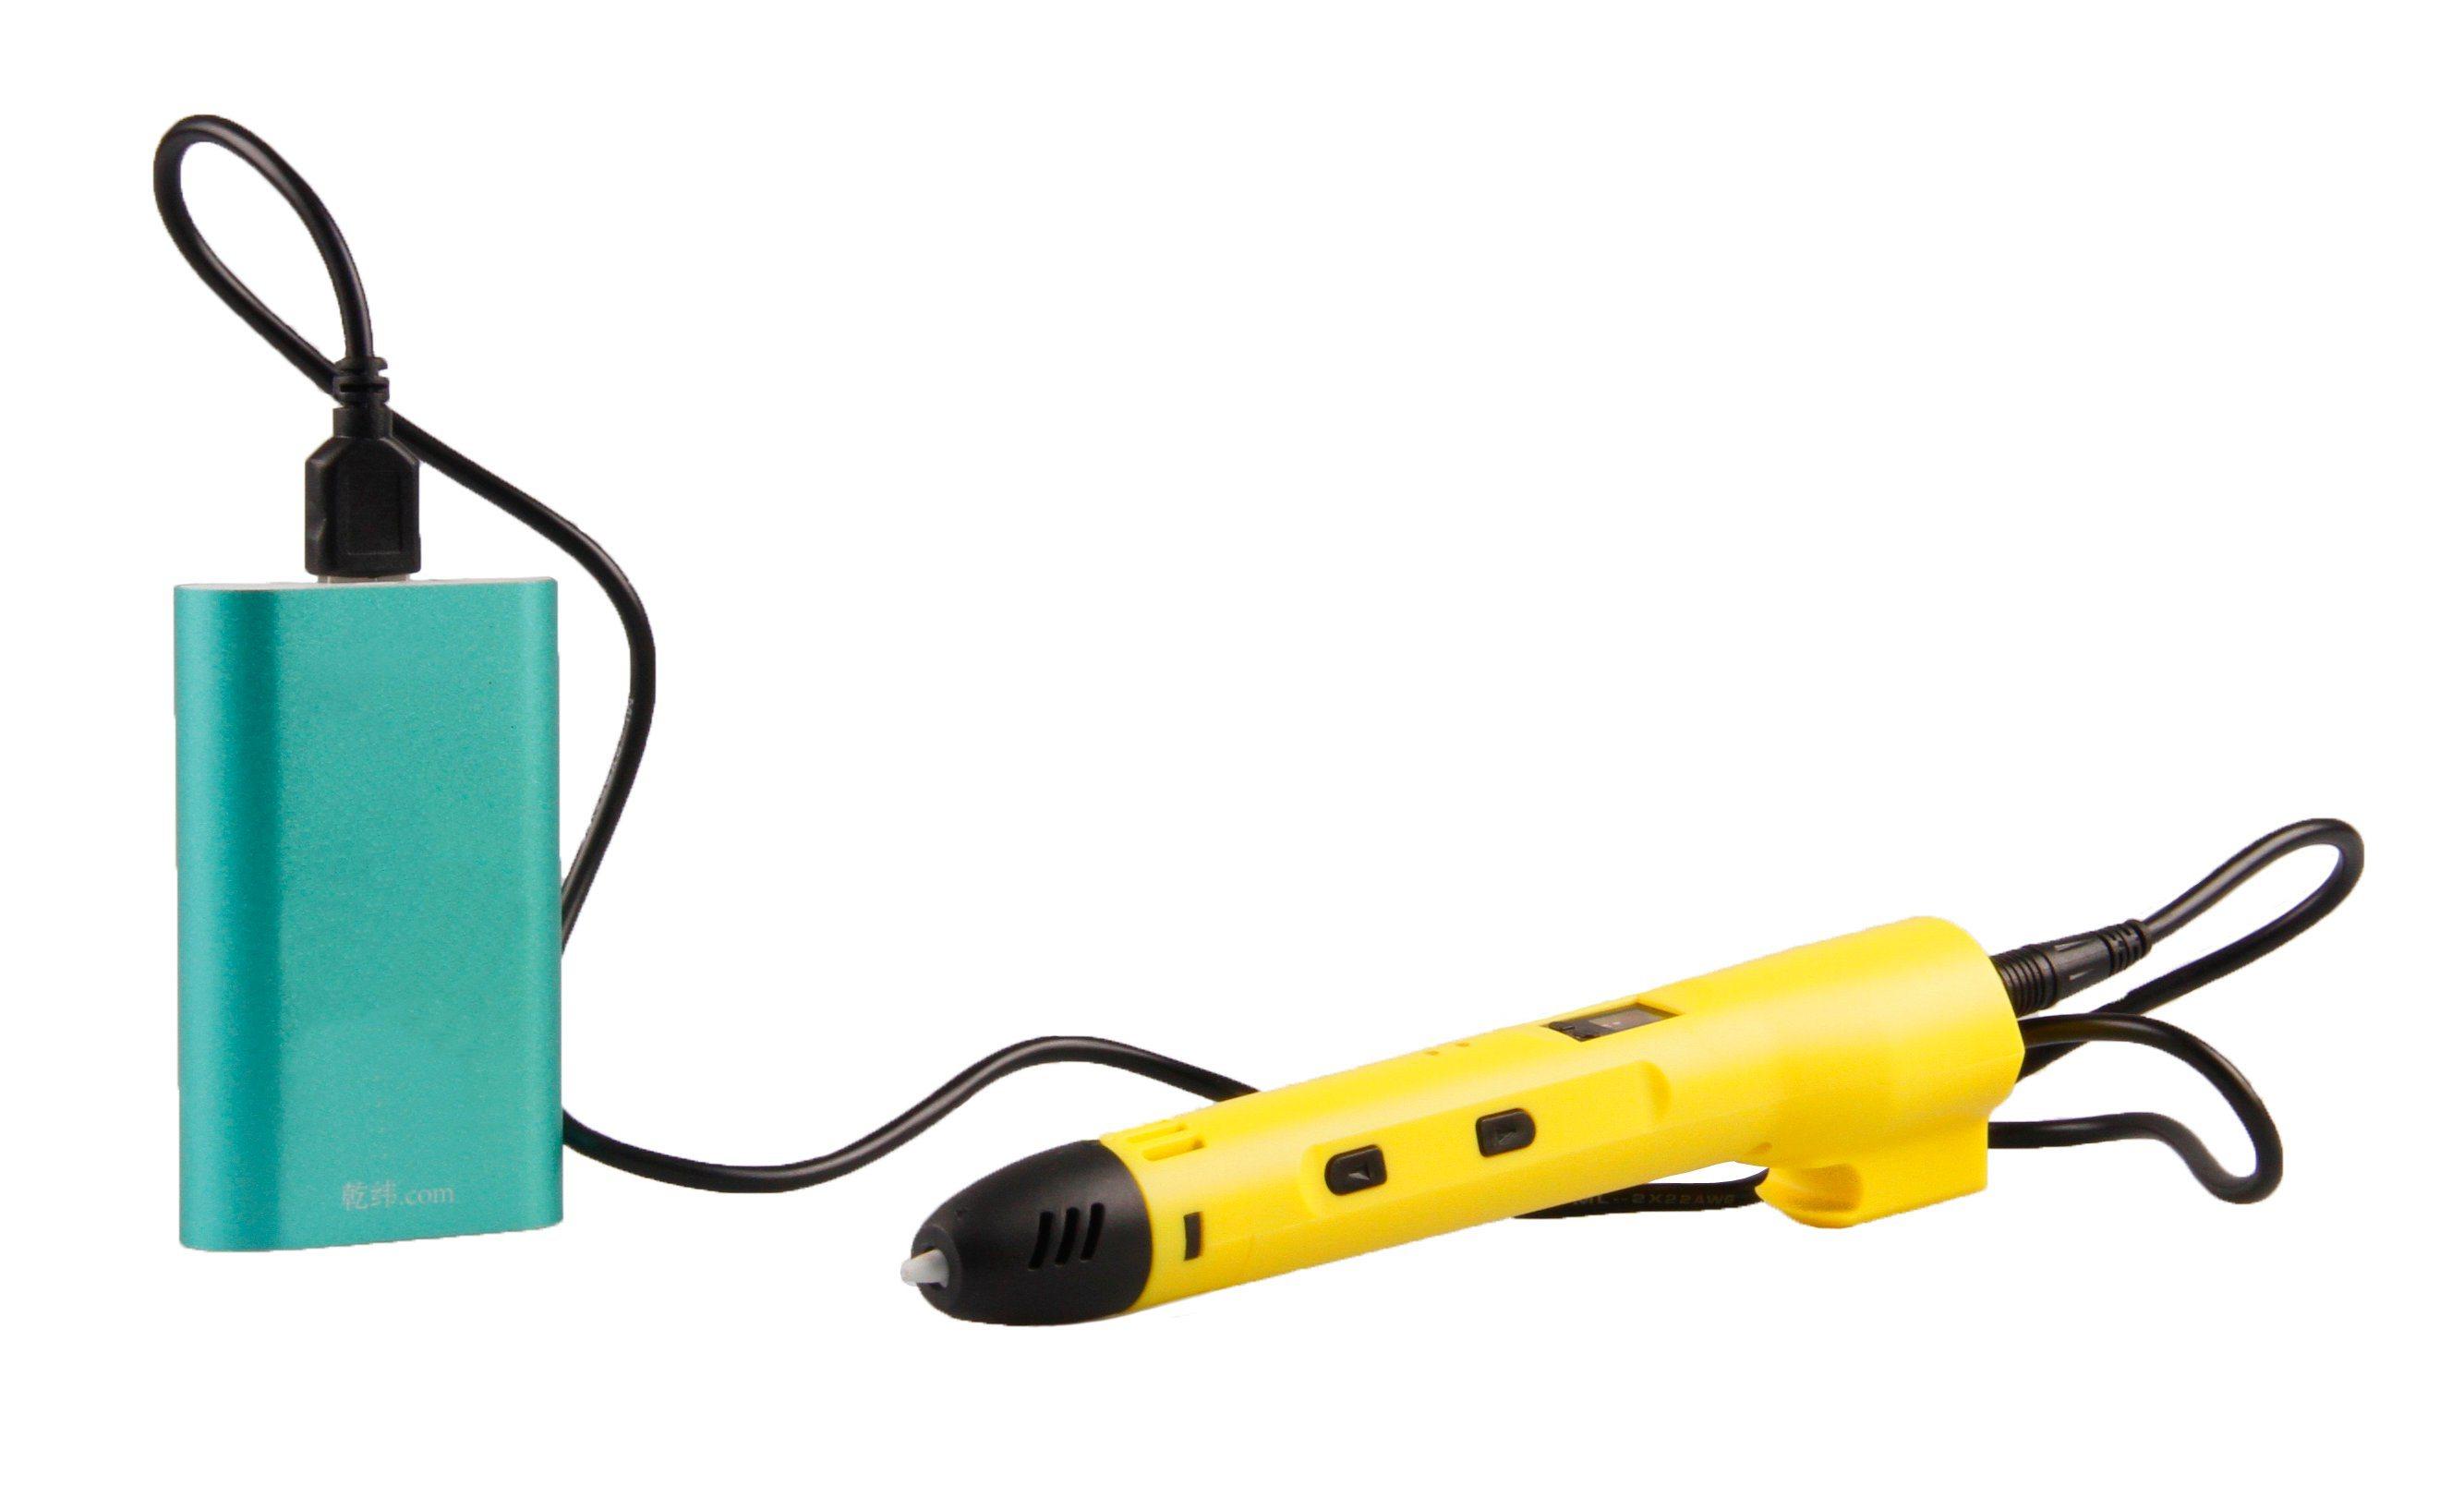 Innovative Handheld Magic Gift 3D Air Pen